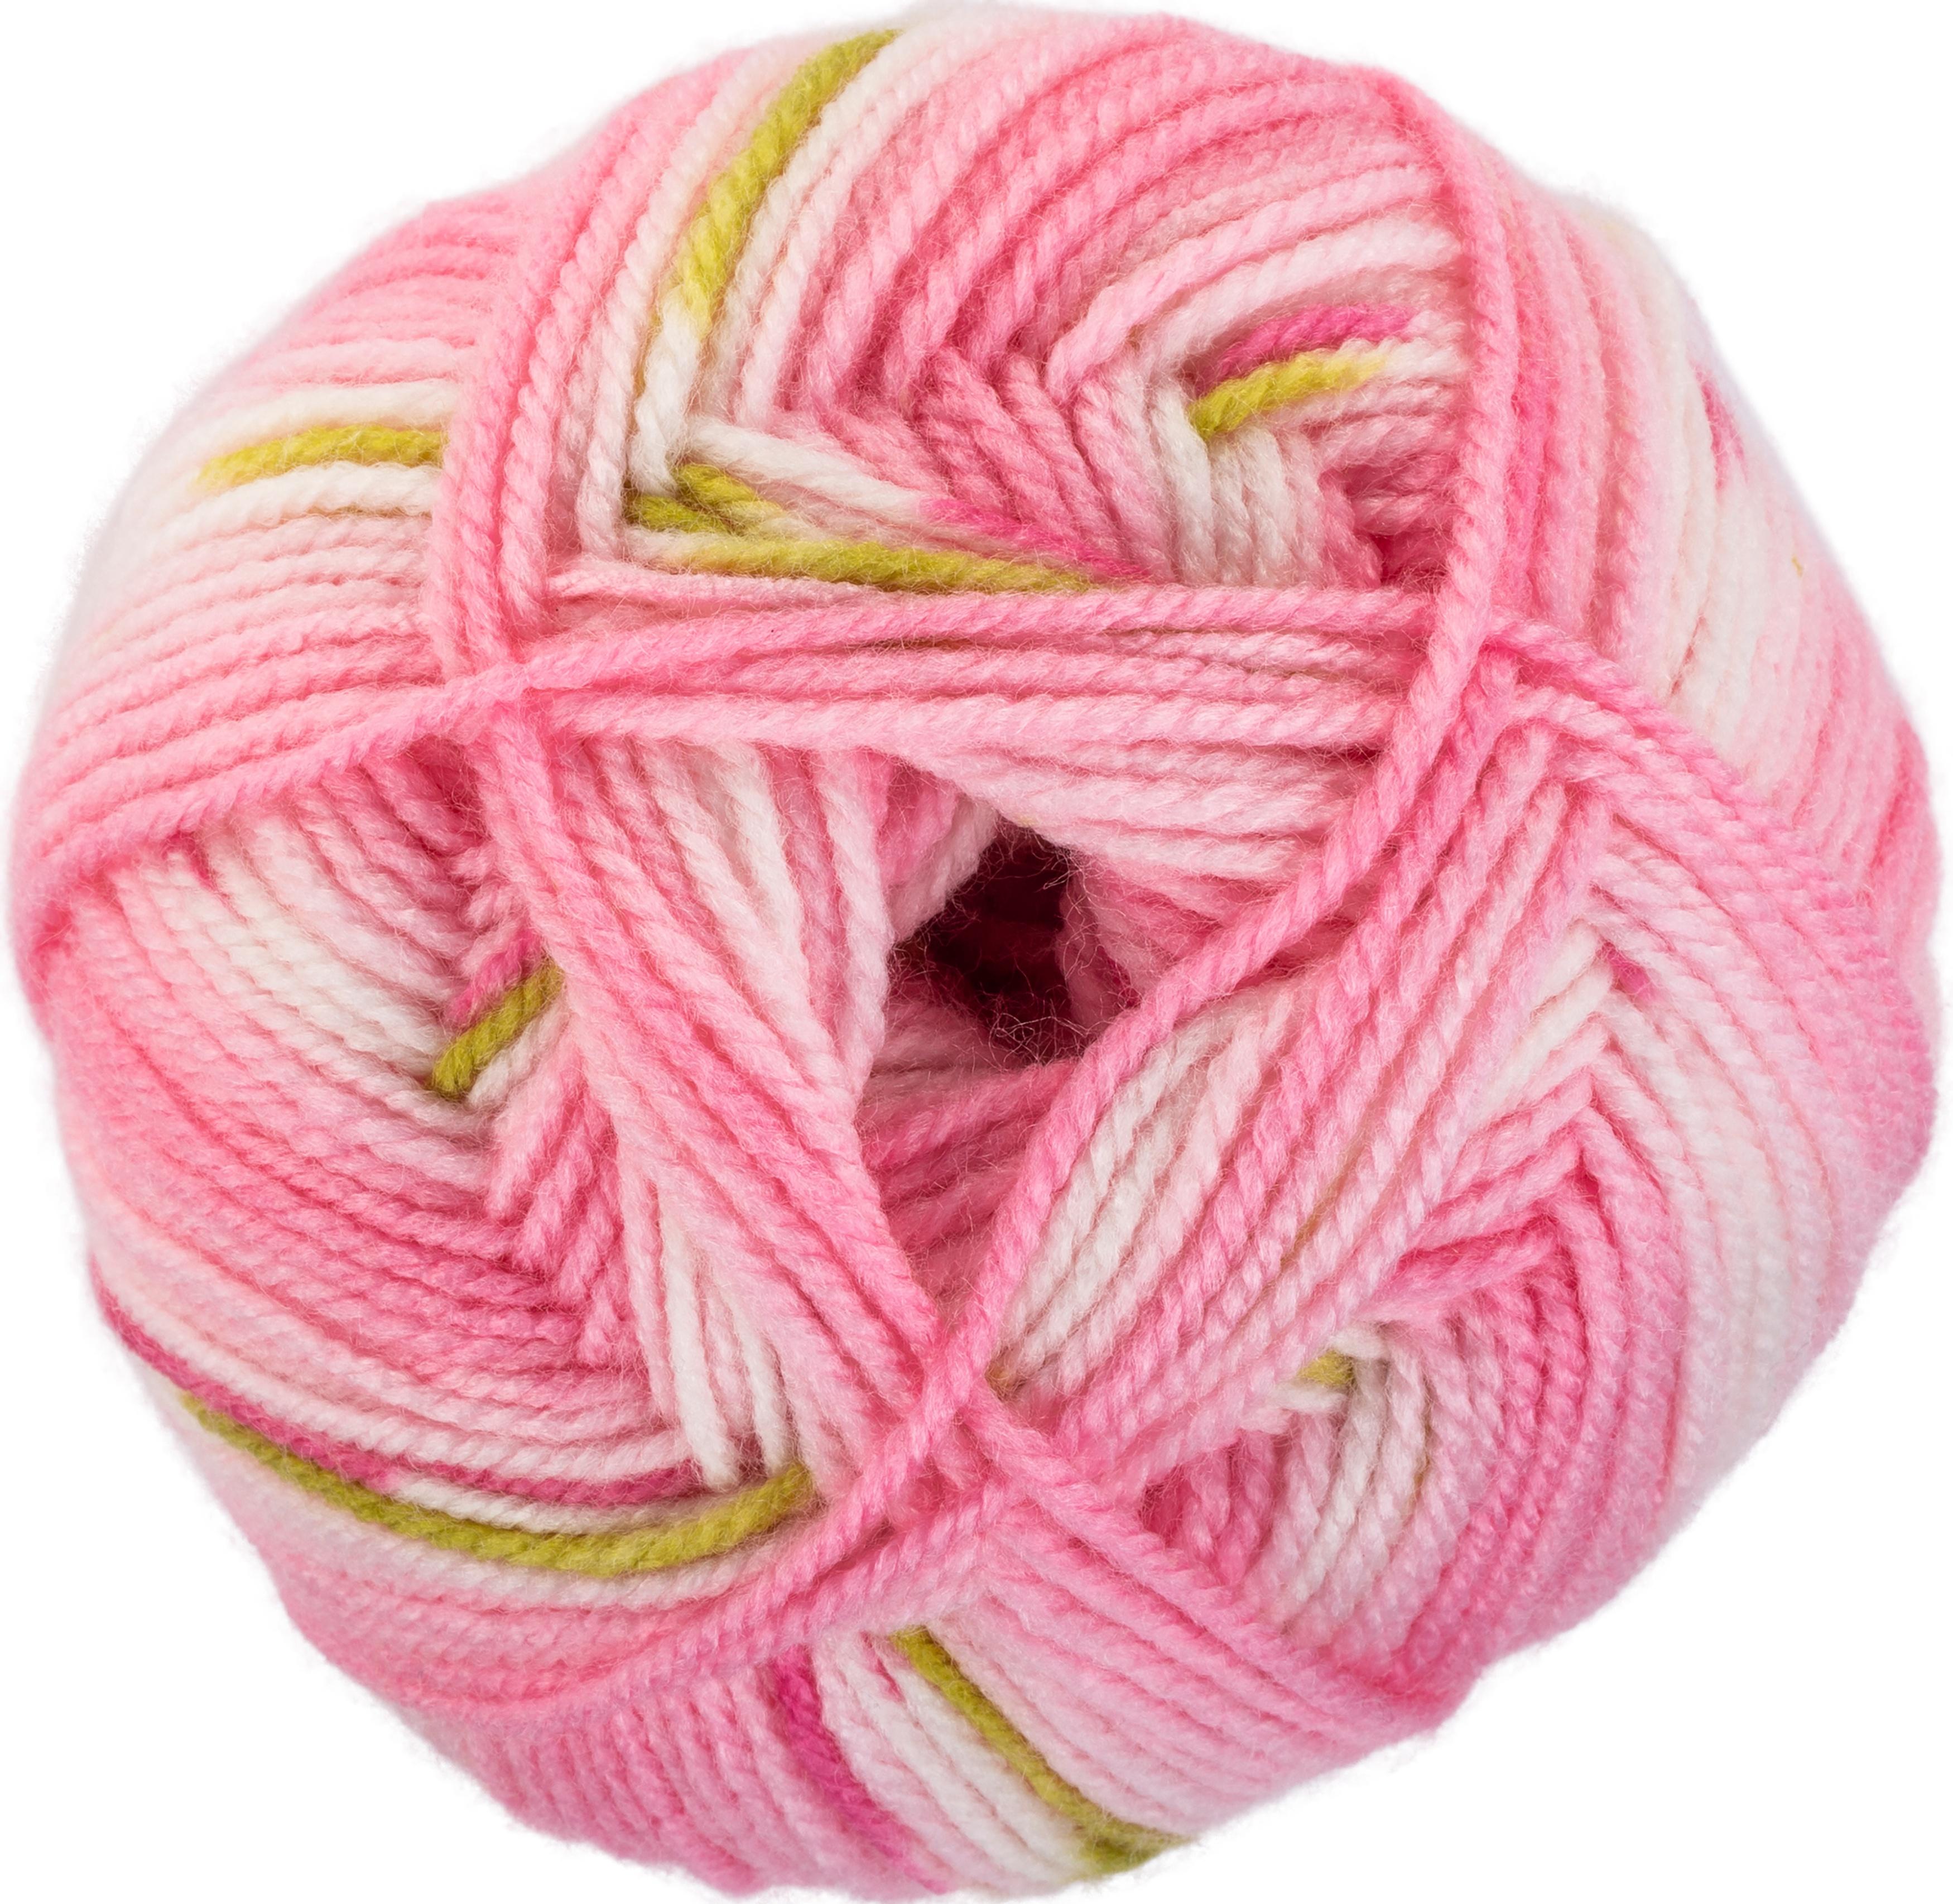 Red Heart Hugs /& Kisses Yarn-Hot Pink